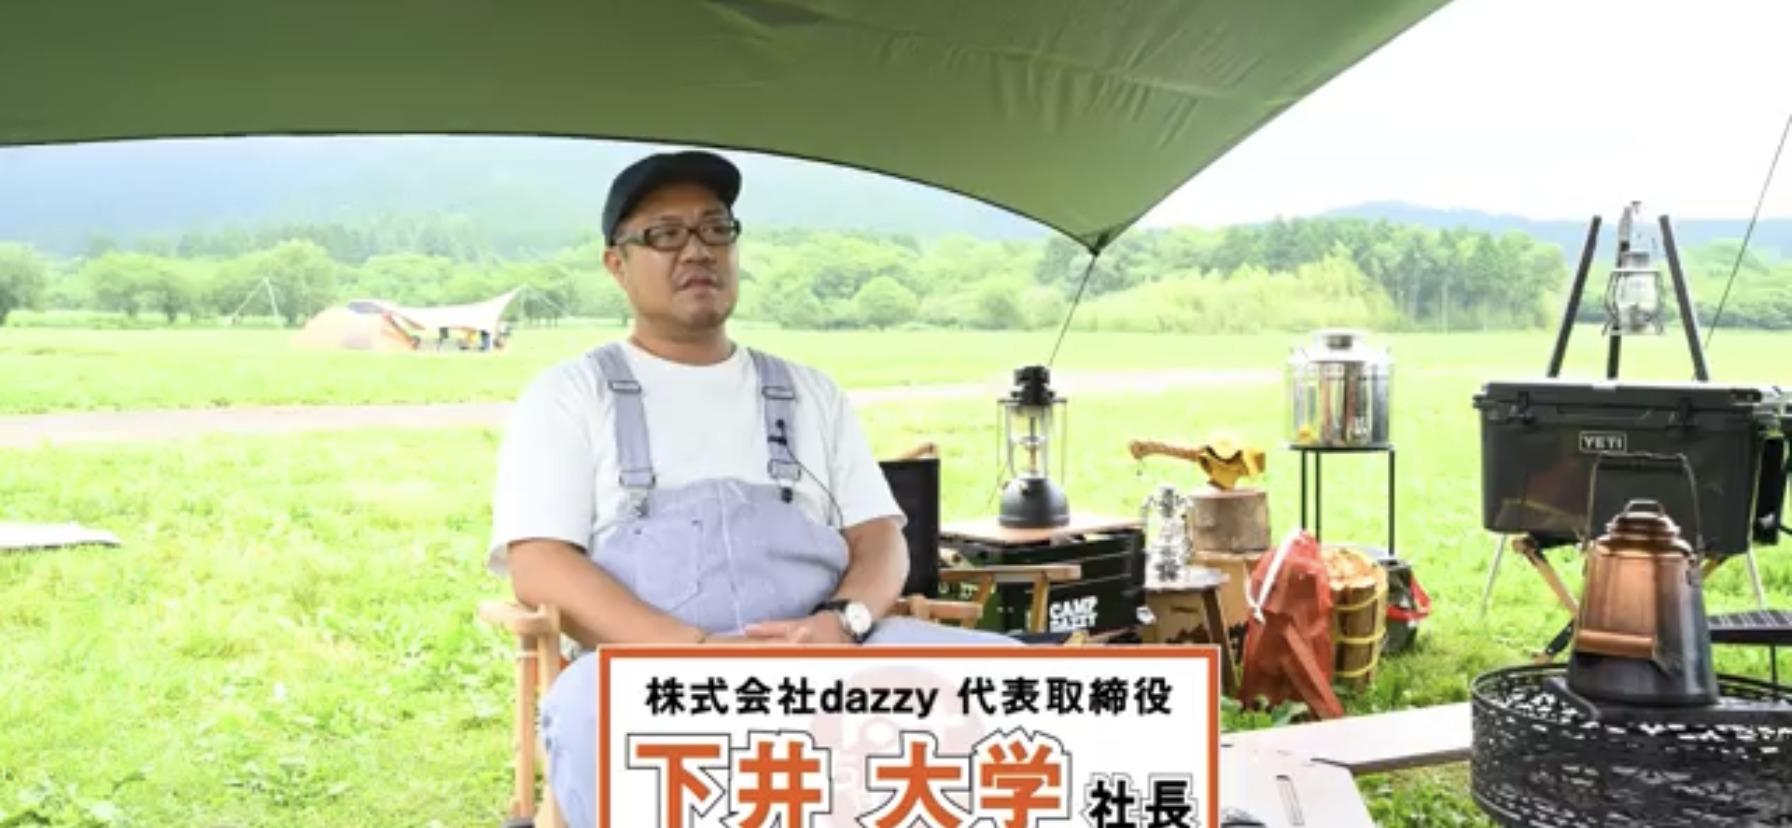 株式会社dazzy下井社長の写真